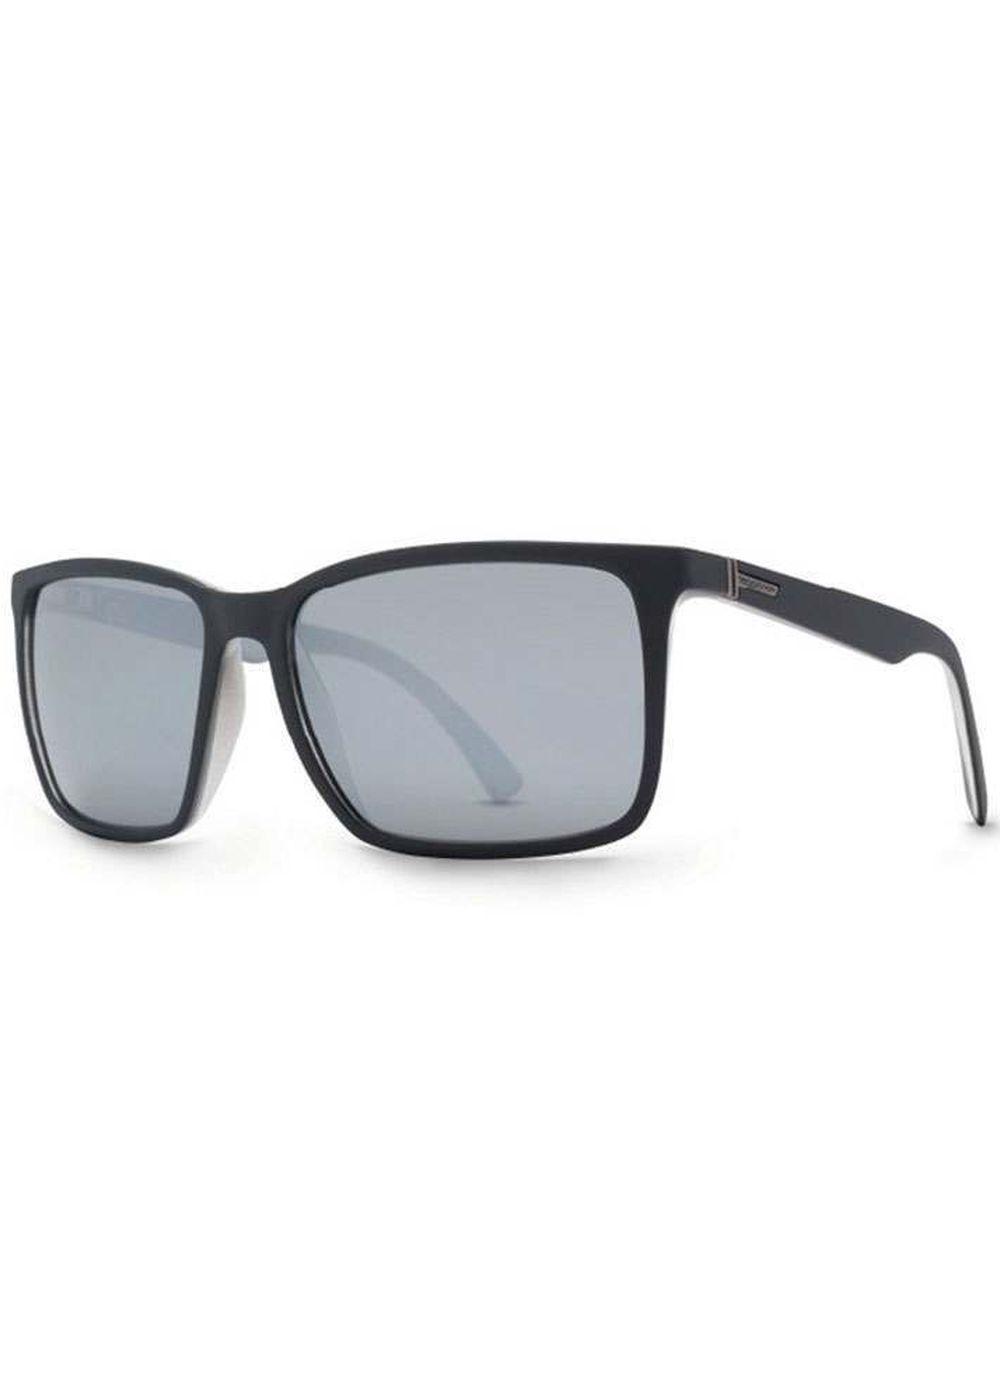 vonzipper-lesmore-sunglasses-black-satinlunar-chr